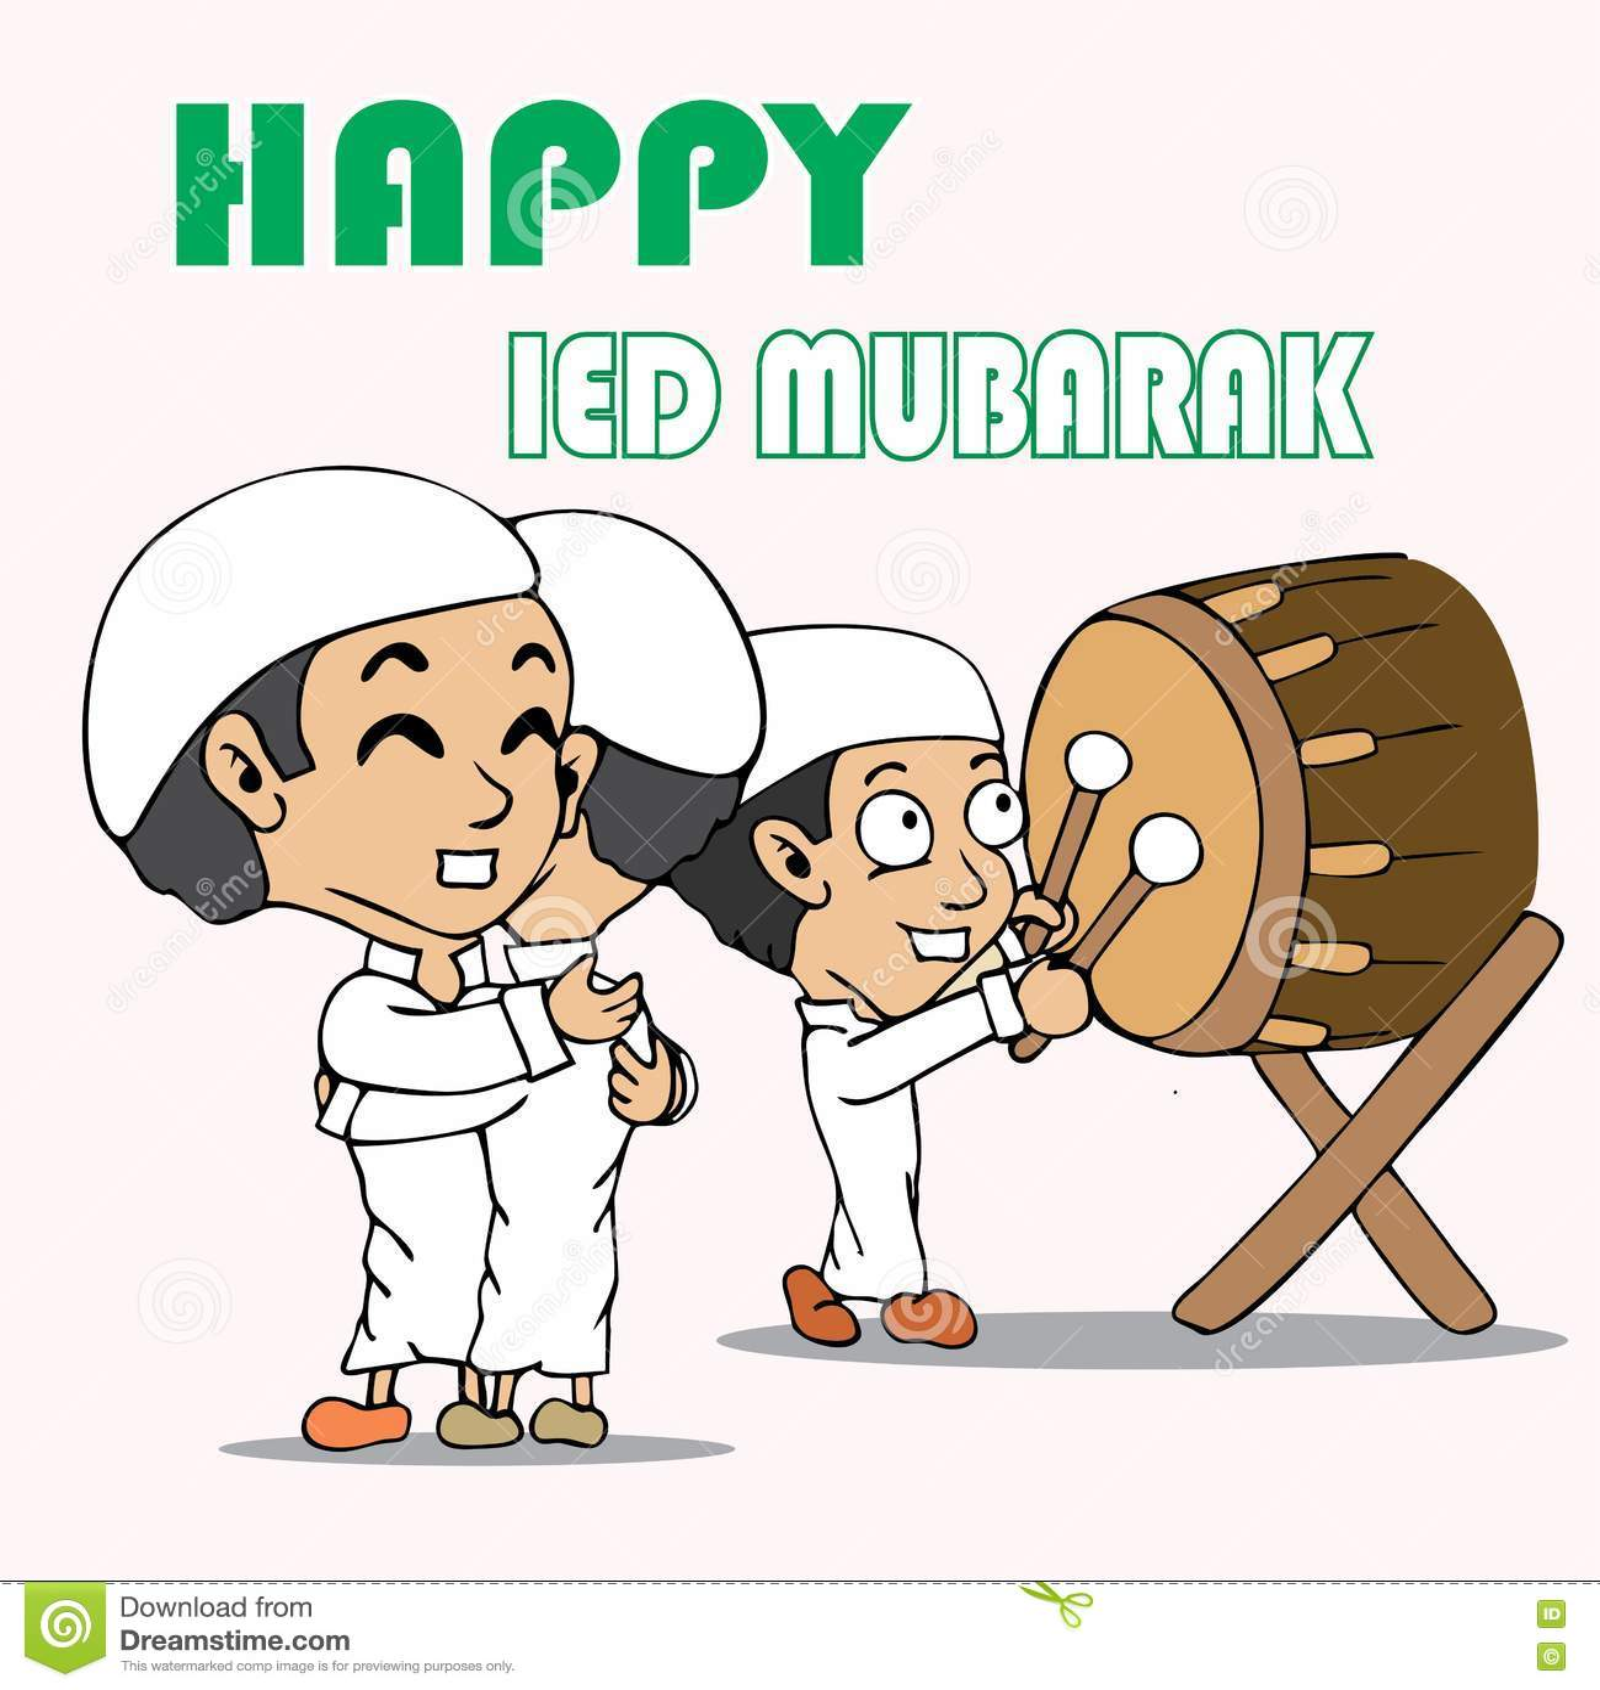 Happy Ied Mubarak Cartoon Stock Illustration. Illustration